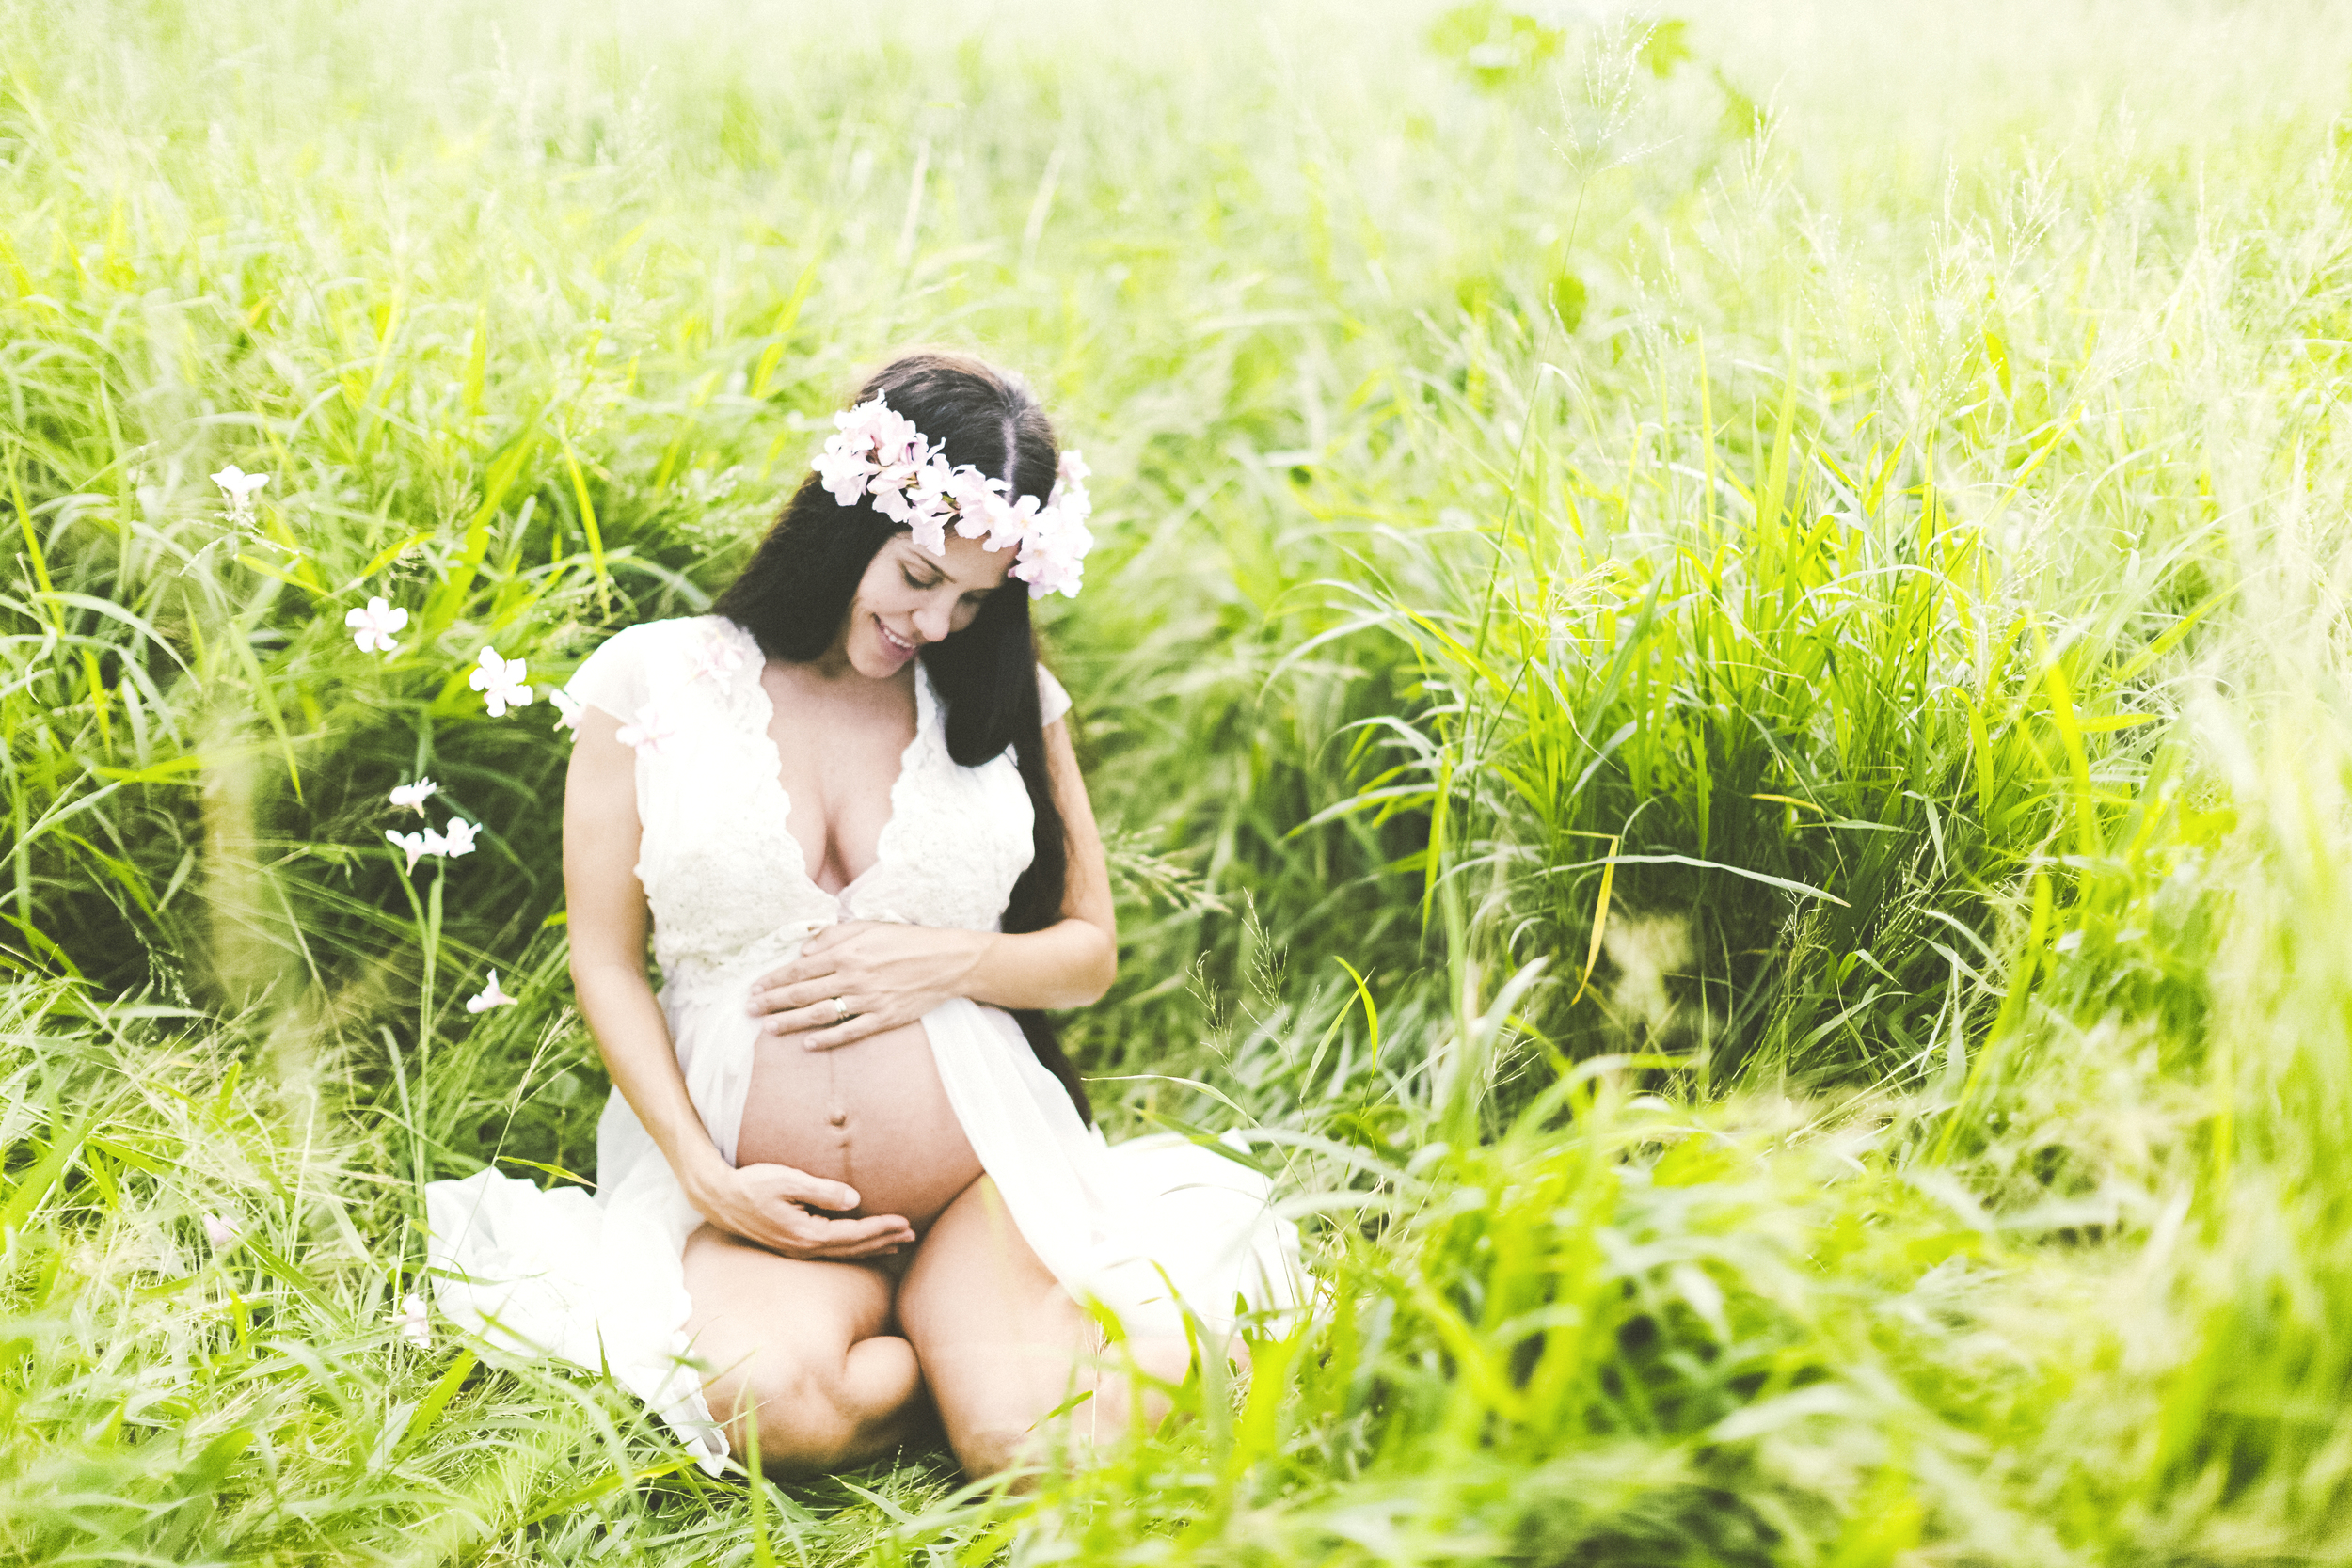 angie-diaz-photography-maui-maternity-twins-2.jpg